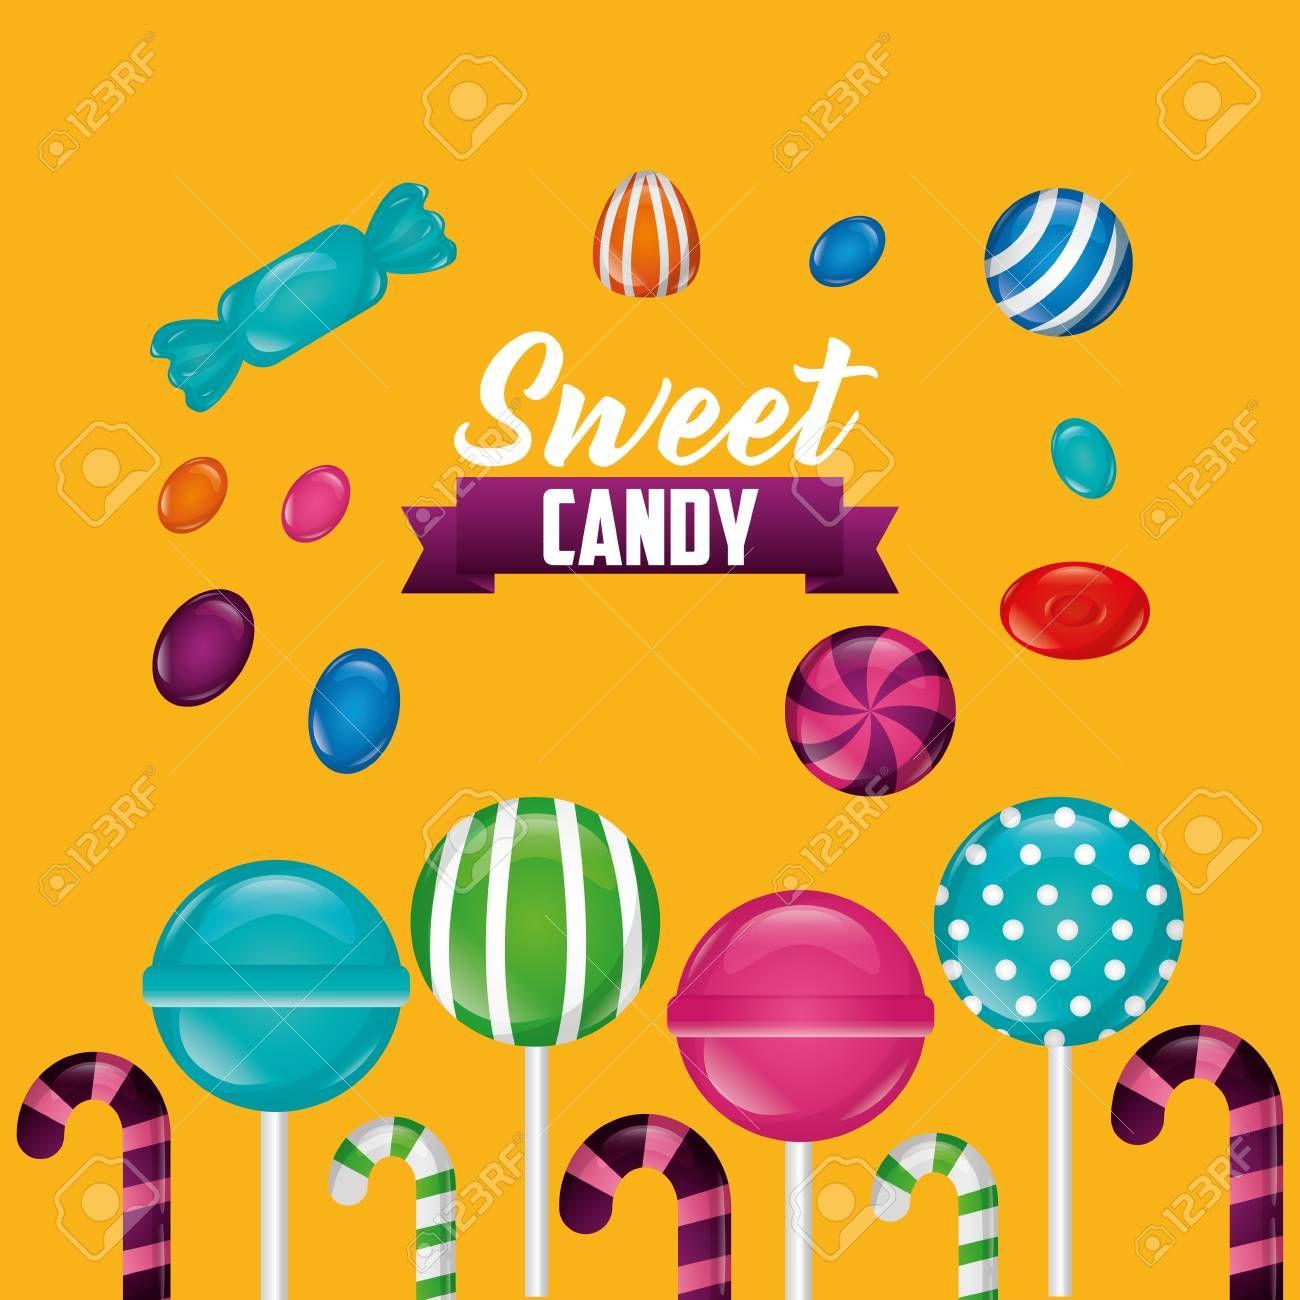 sweet candy ribbon sign bombom candy canes bananas vector